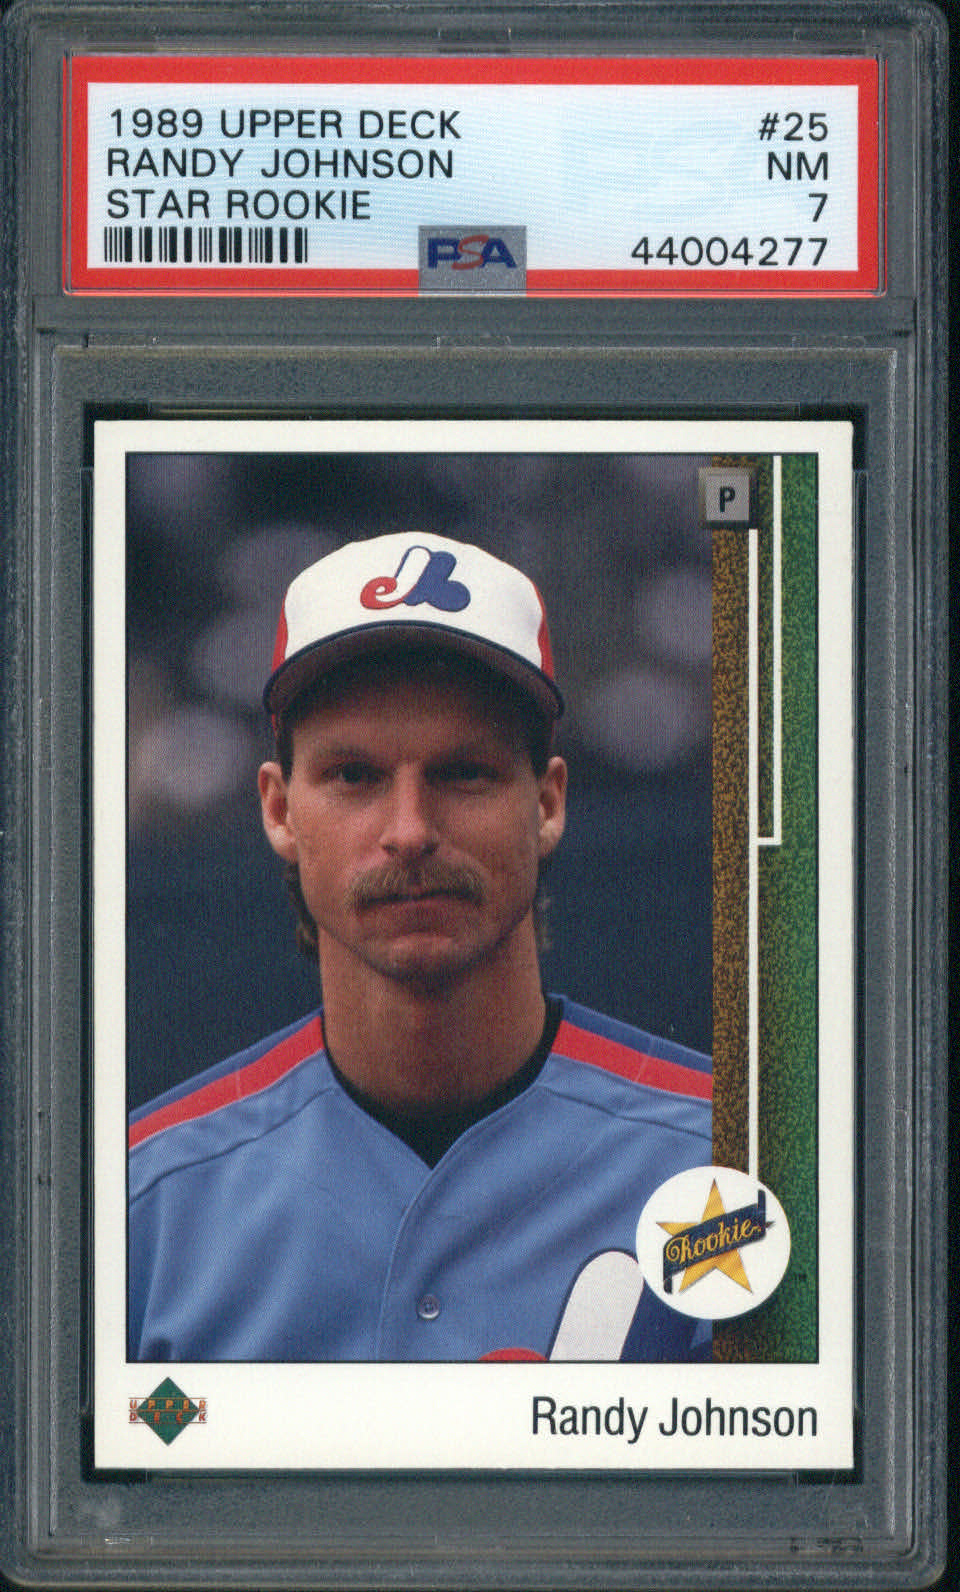 1989 Upper Deck Star Rookie #25 Randy Johnson PSA 7